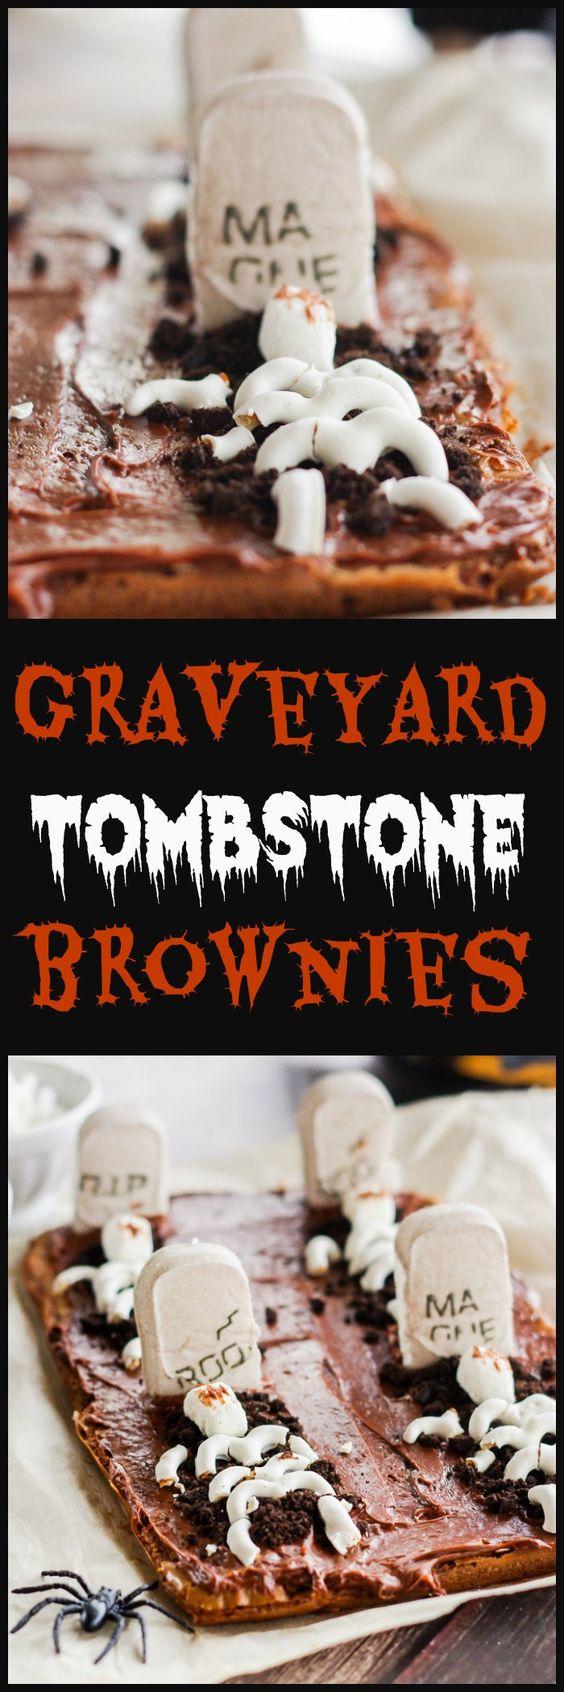 Graveyard Tombstone Brownies | Graveyards, Brownies and A Box